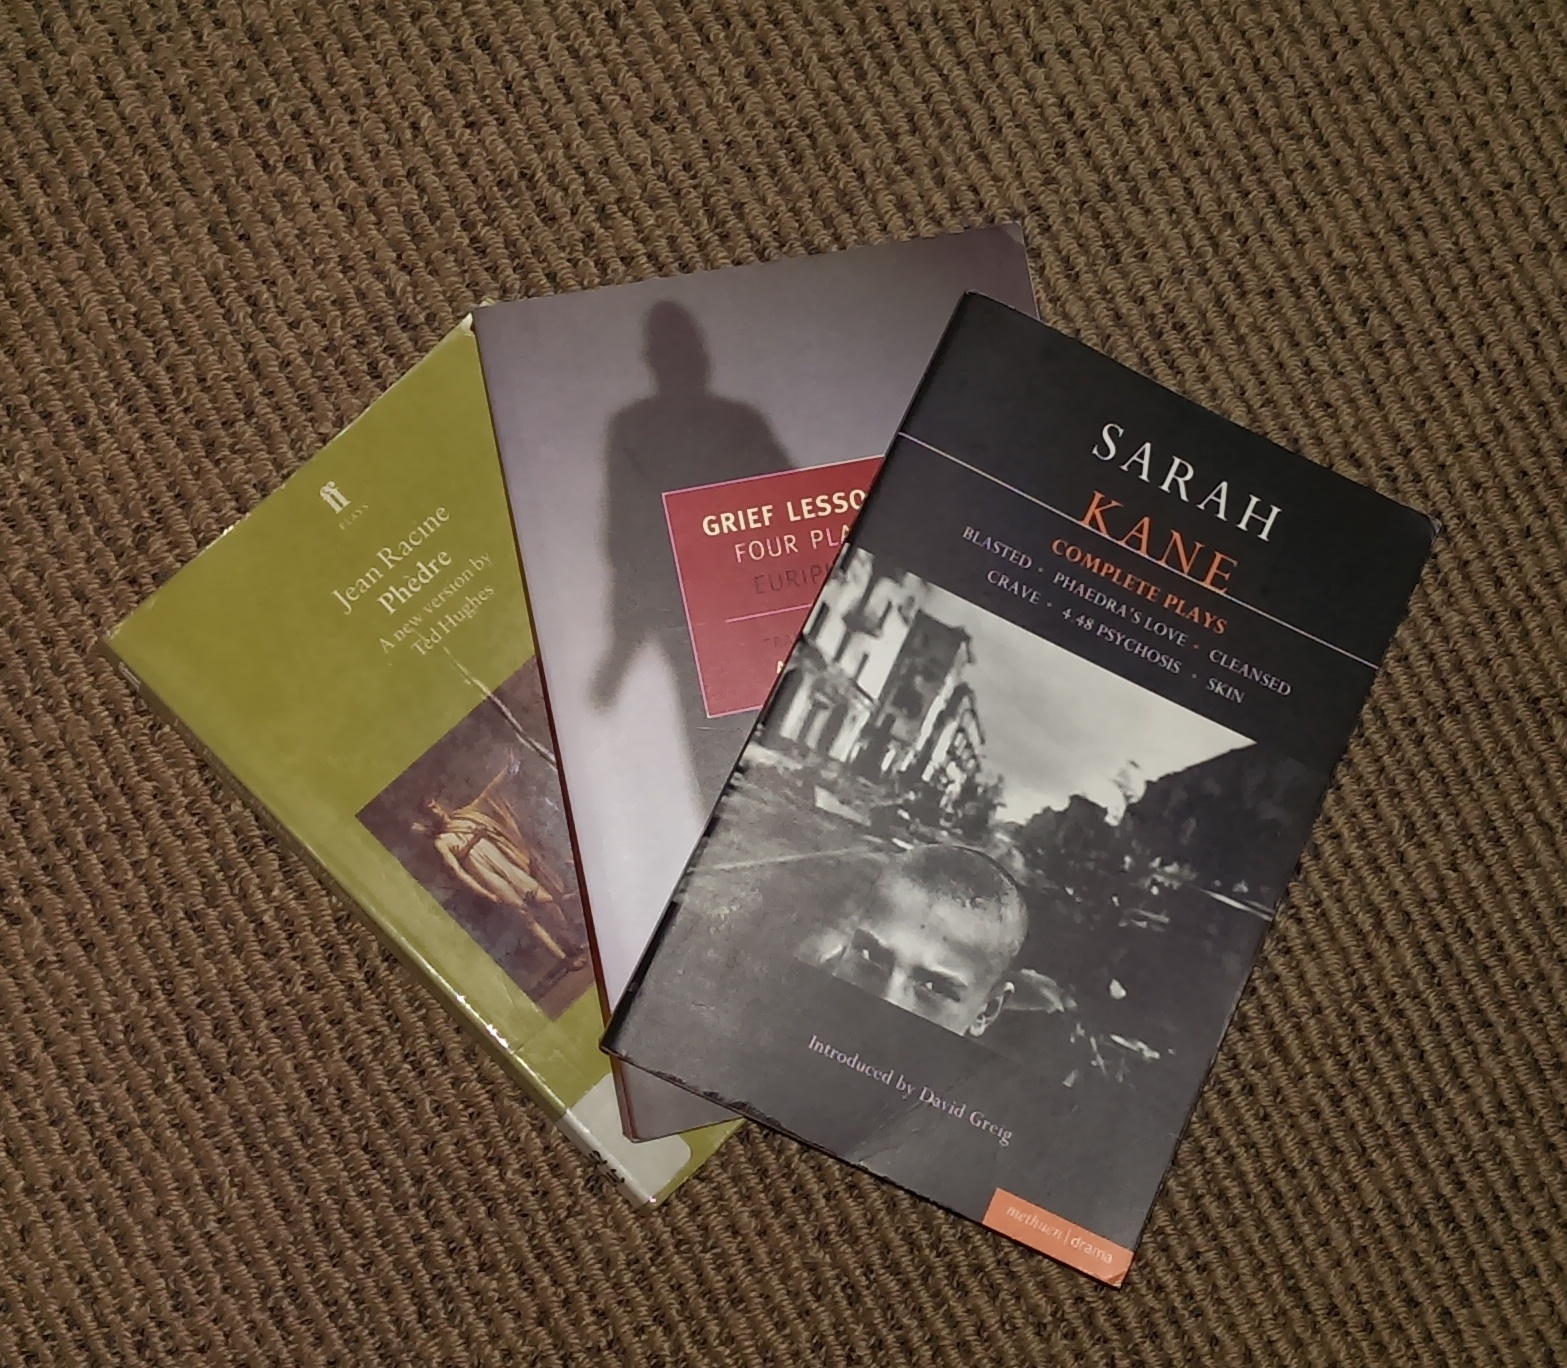 phaedra essays Phaedra's love by sarah kane - part 2 - love essay example the play phaedra's love, by sarah kane, takes the classic greek.